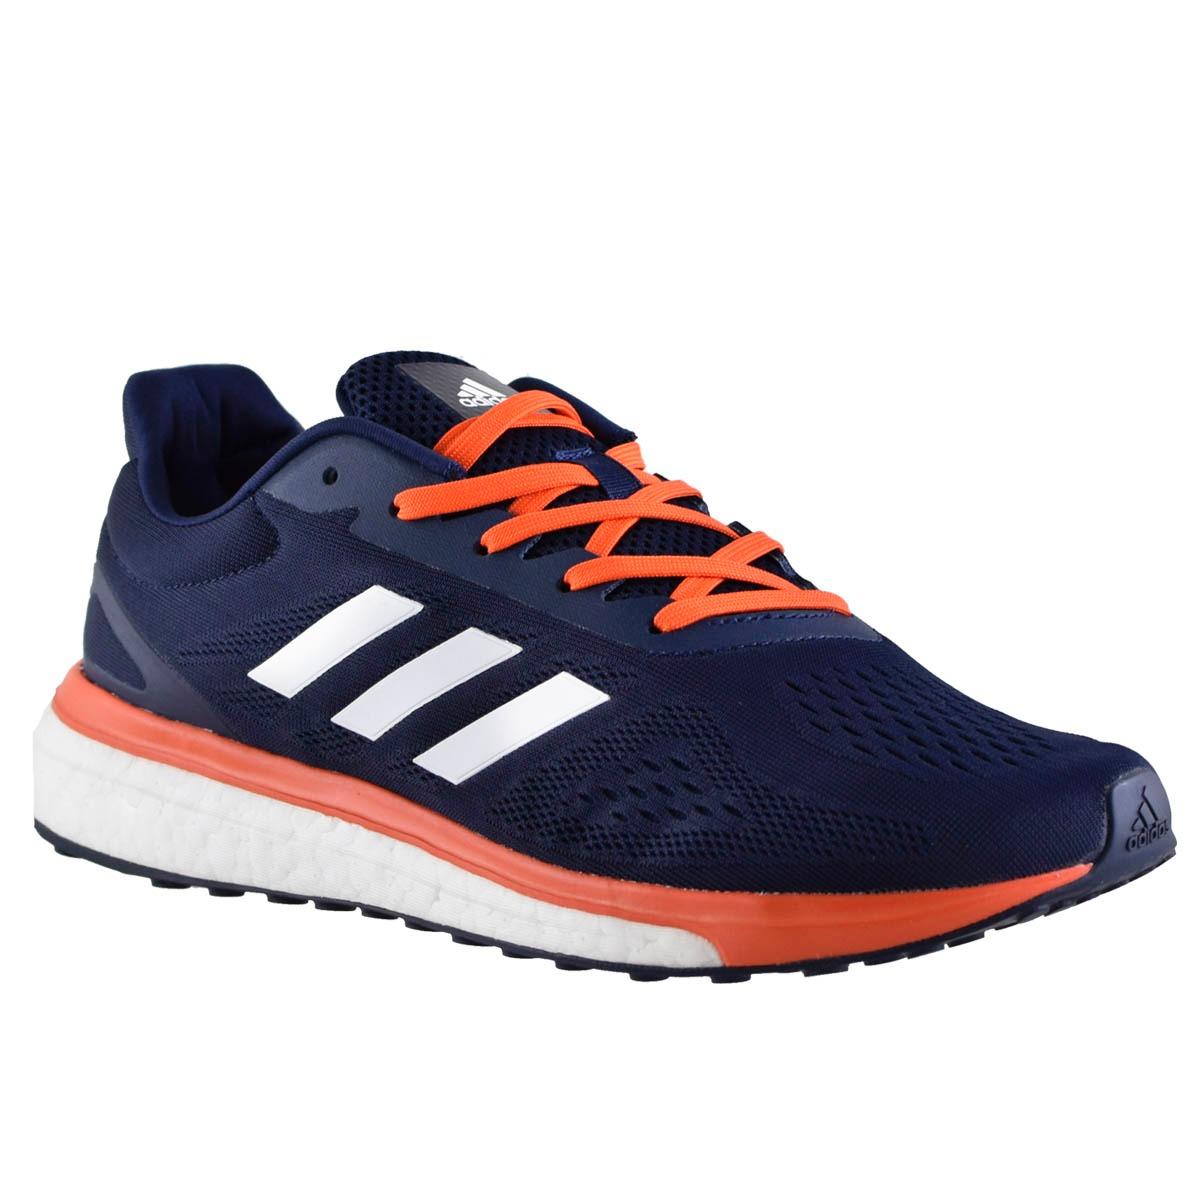 low priced cb1d6 73475 zapatillas adidas response lt hombre azul. Cargando zoom.